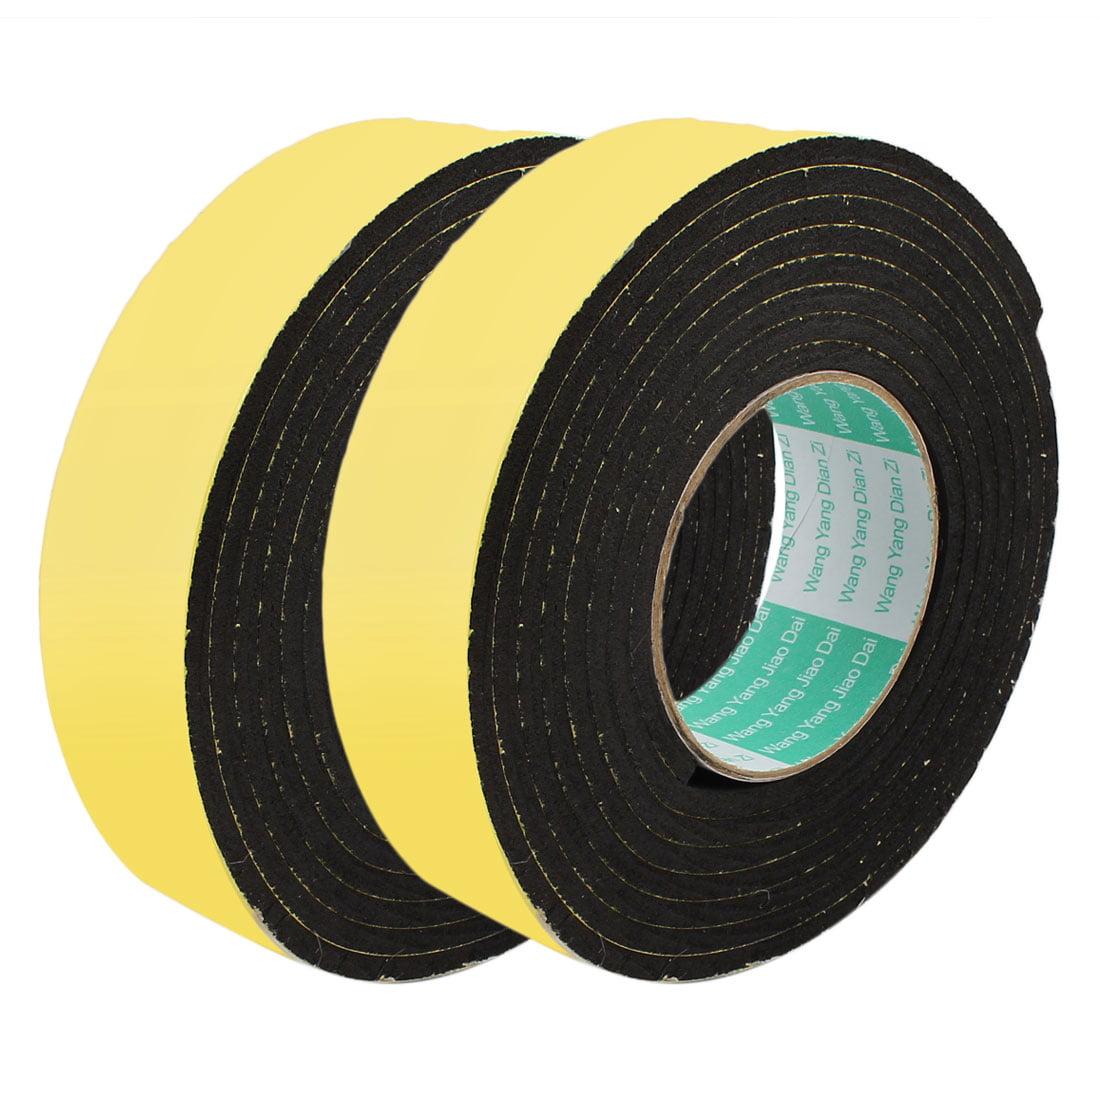 2pcs 3Meter 40mm x 5mm Single-side Adhesive Shockproof Sponge Foam Tape Yellow